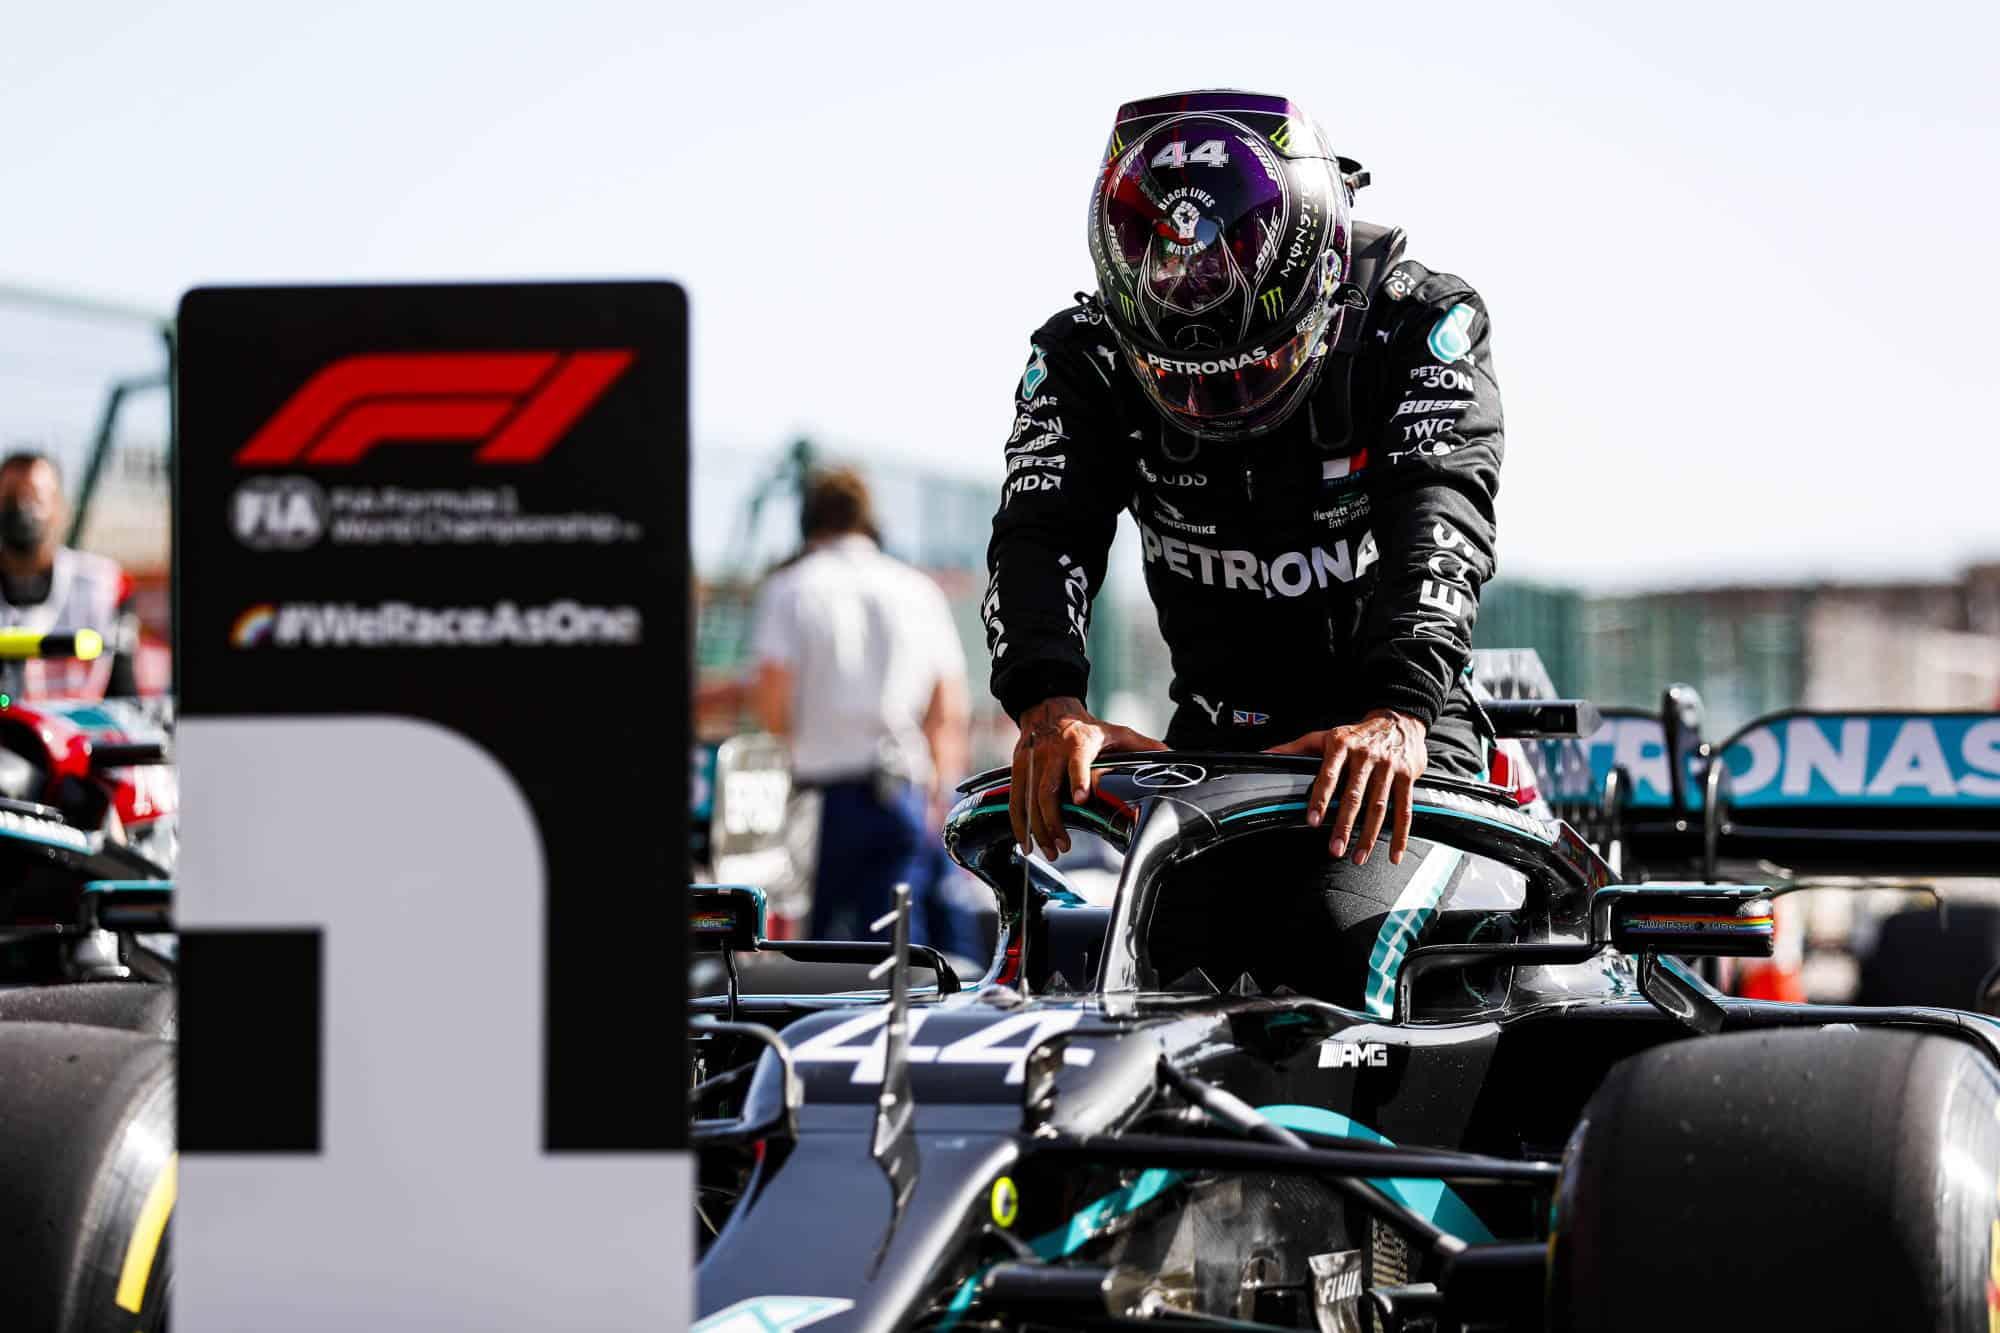 2020 Portugal GP Hamilton Mercedes F1 W11 after qualifying Photo Daimler